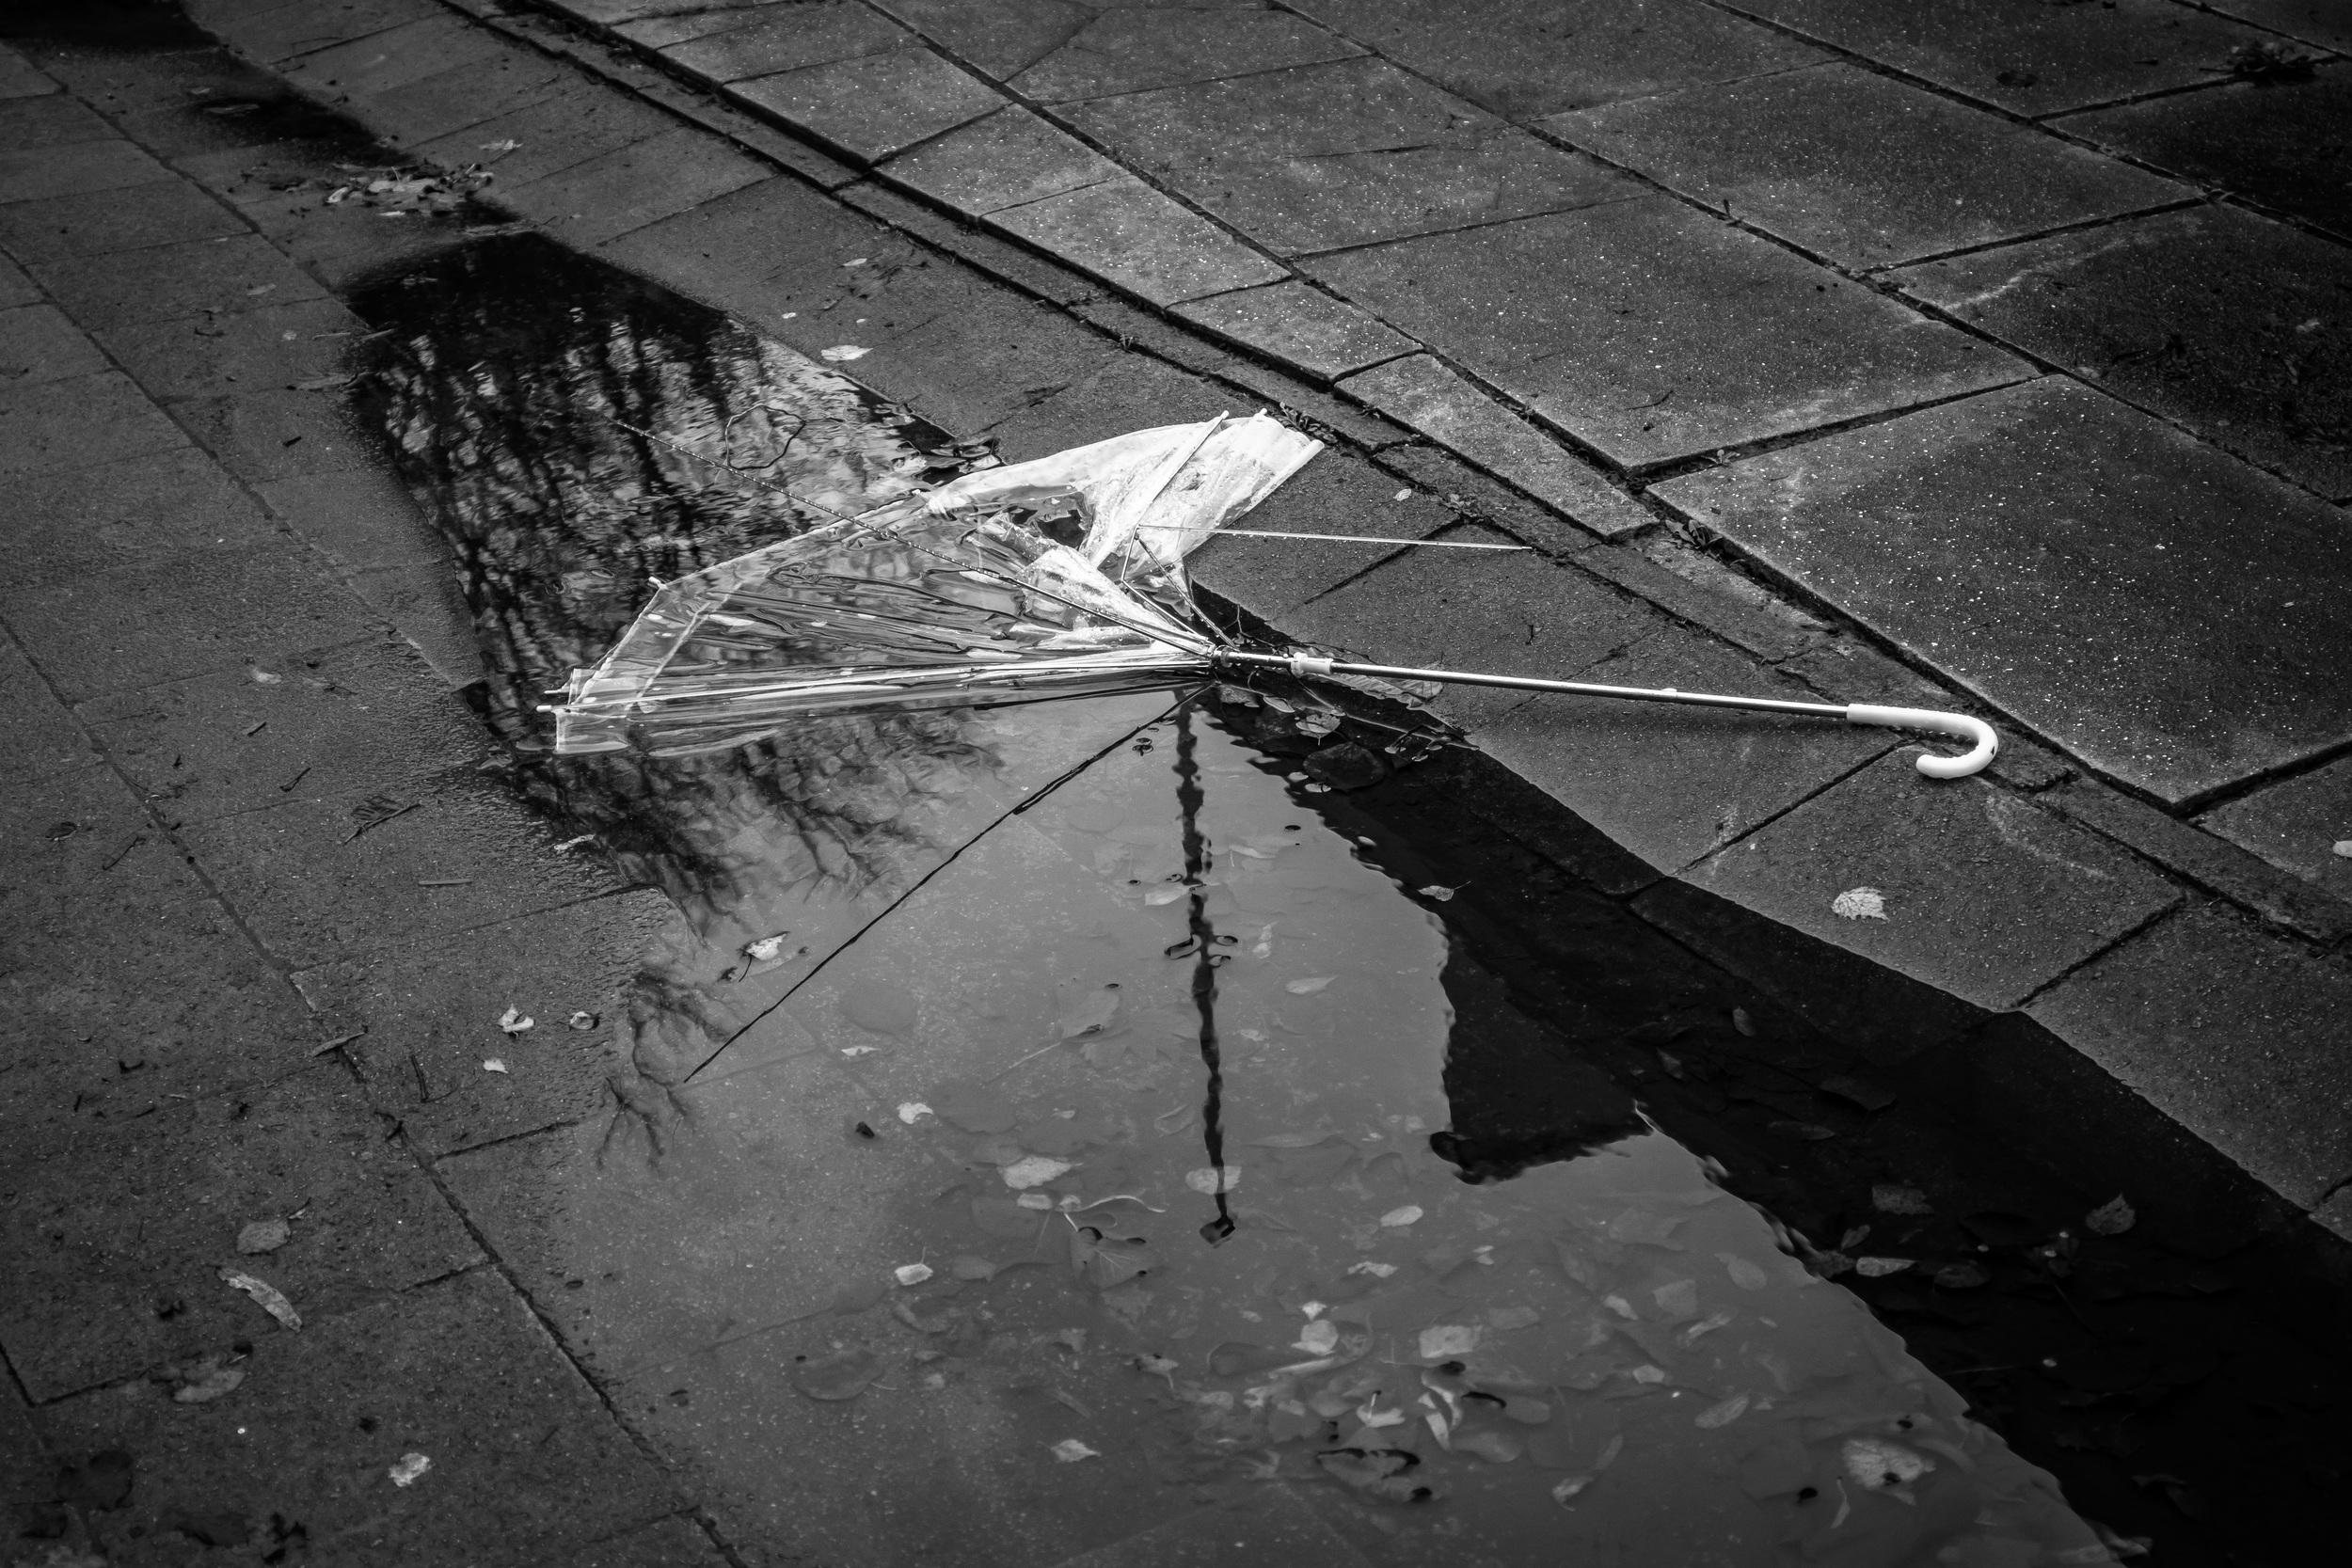 Viewfinder-looks-like-Viviane-Maier-umbrella-paraplu.jpg